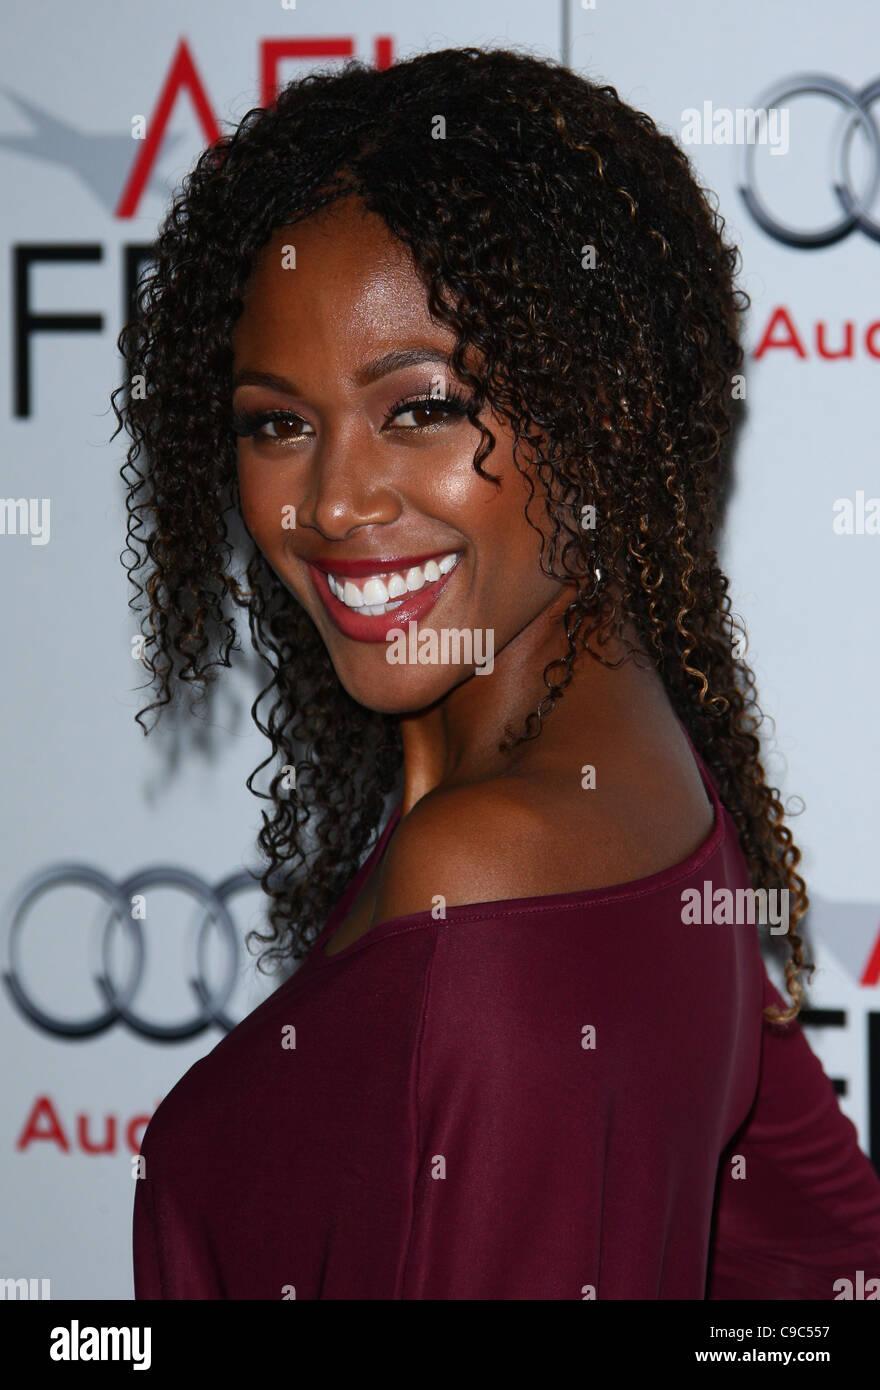 Nicole Beharie - AFI Fest 2011 premiere of Shame held at